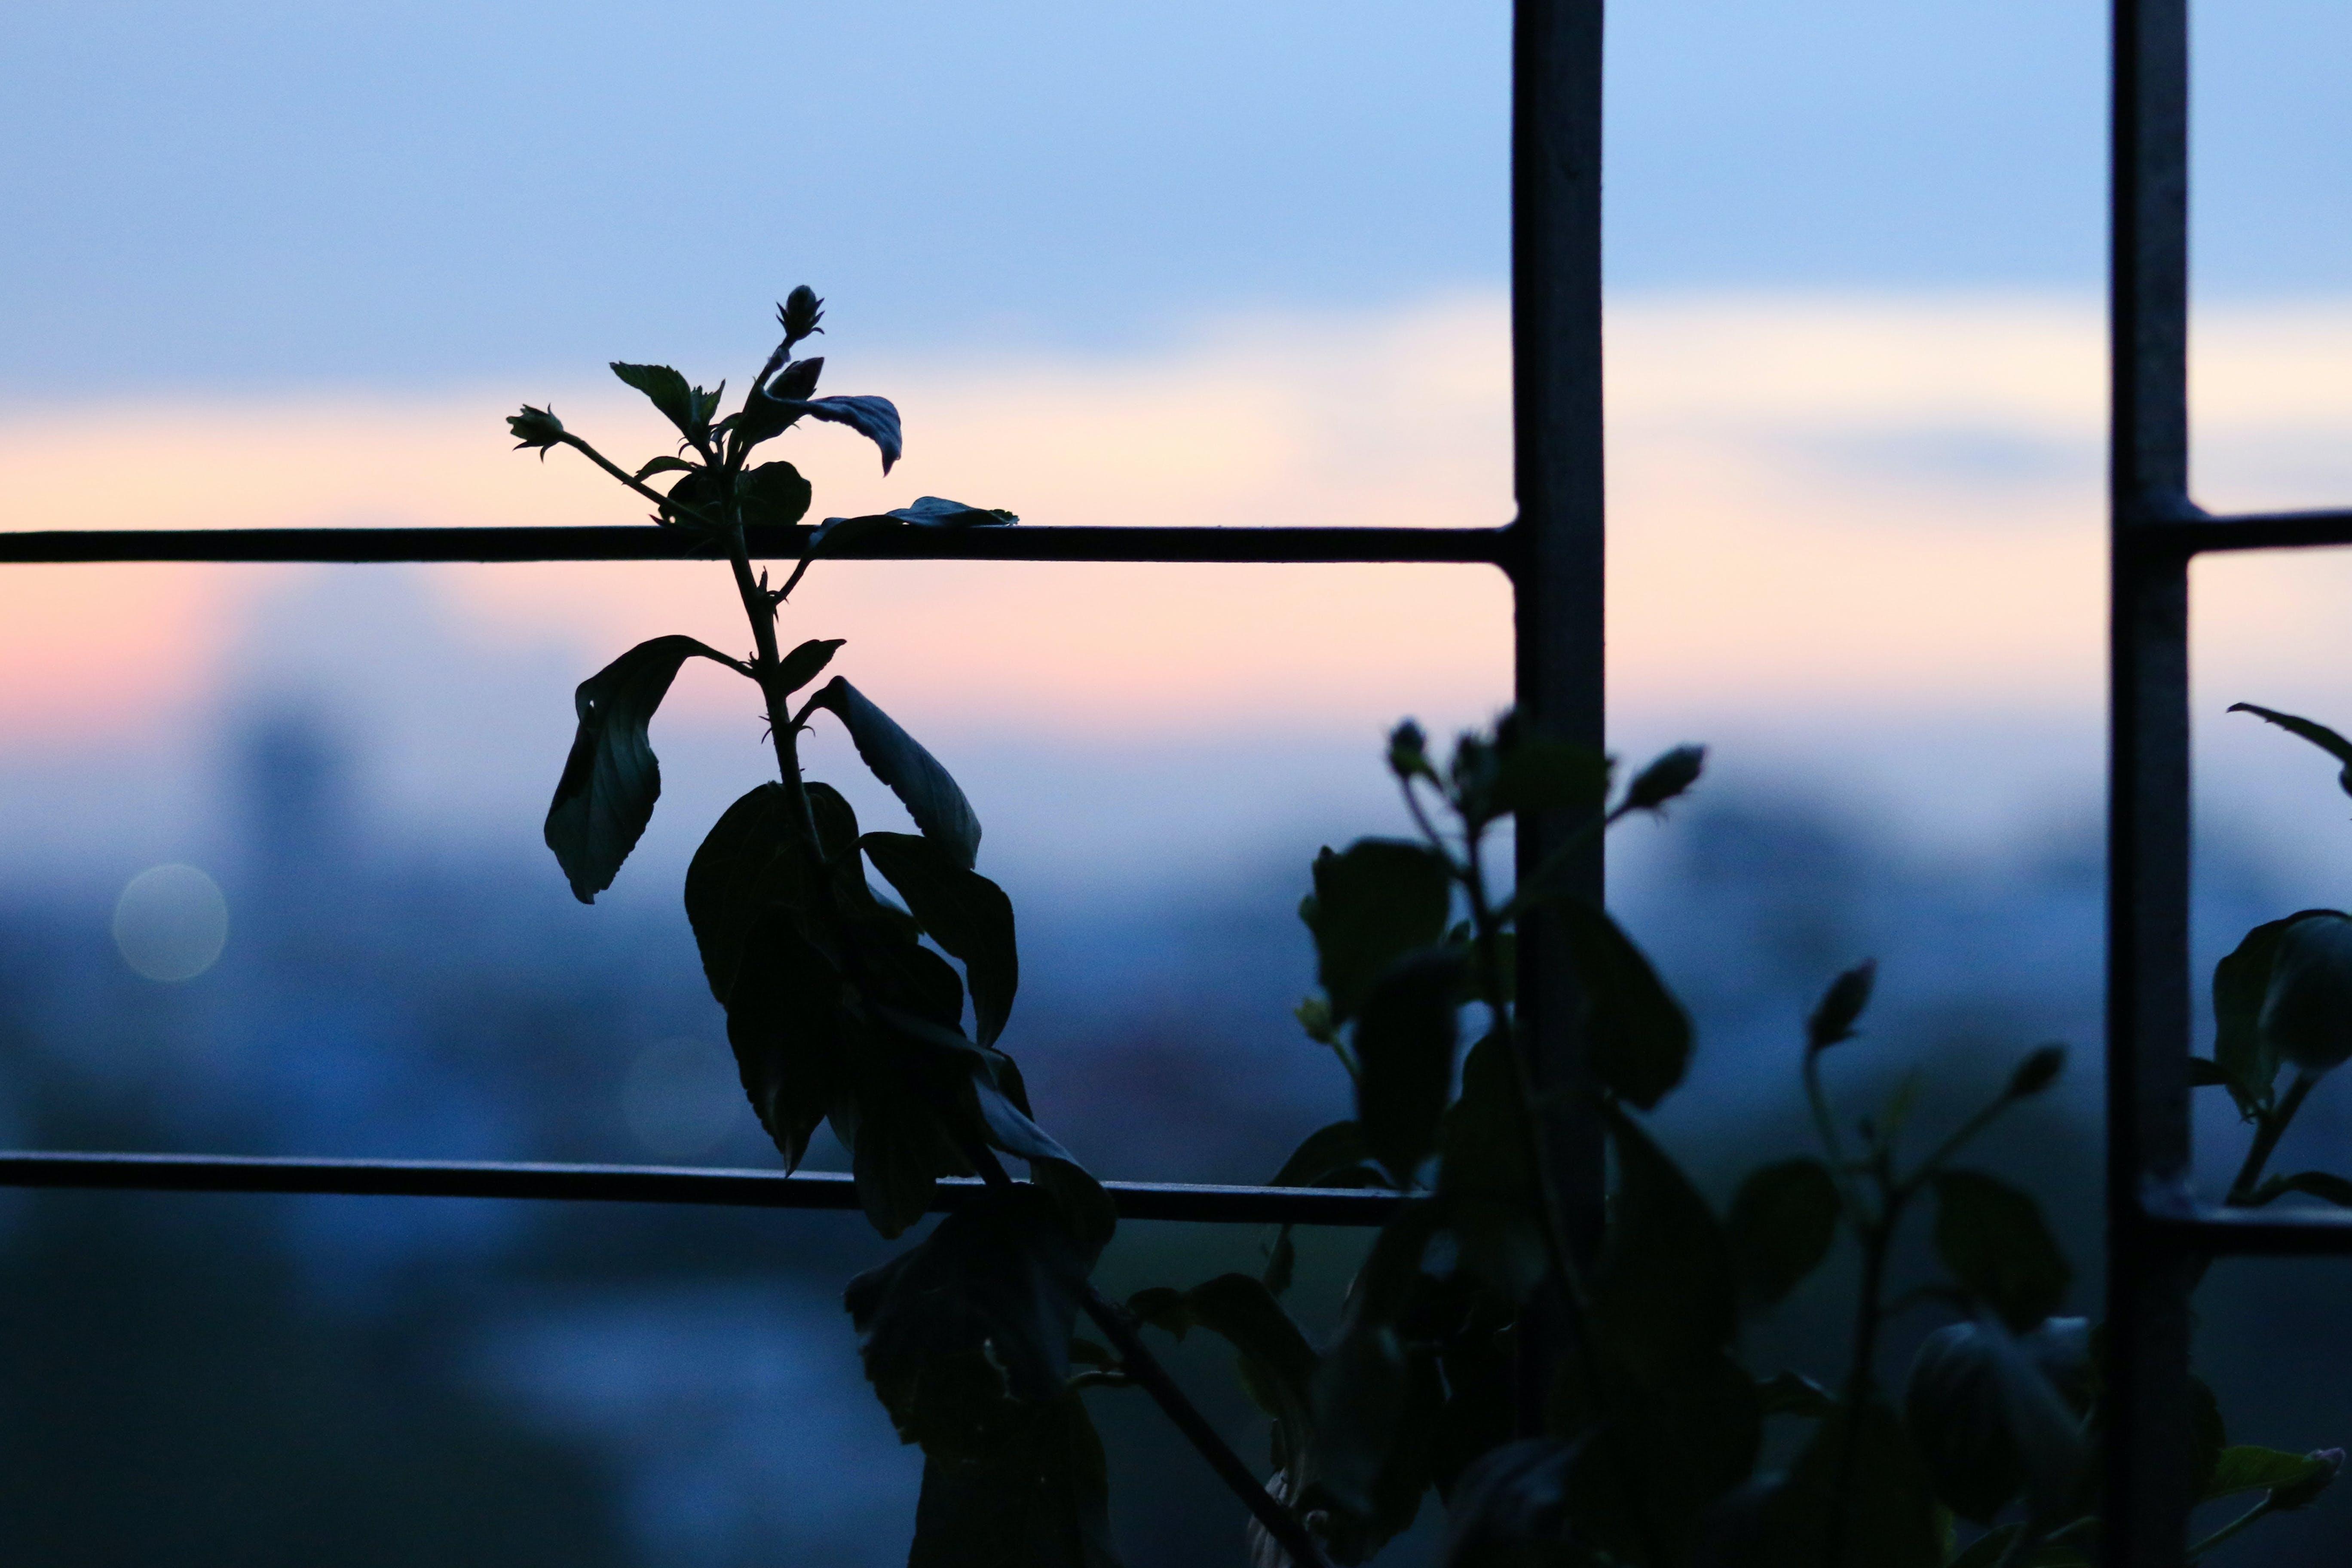 Silhouette Photo of Flower Beside Metal Frame